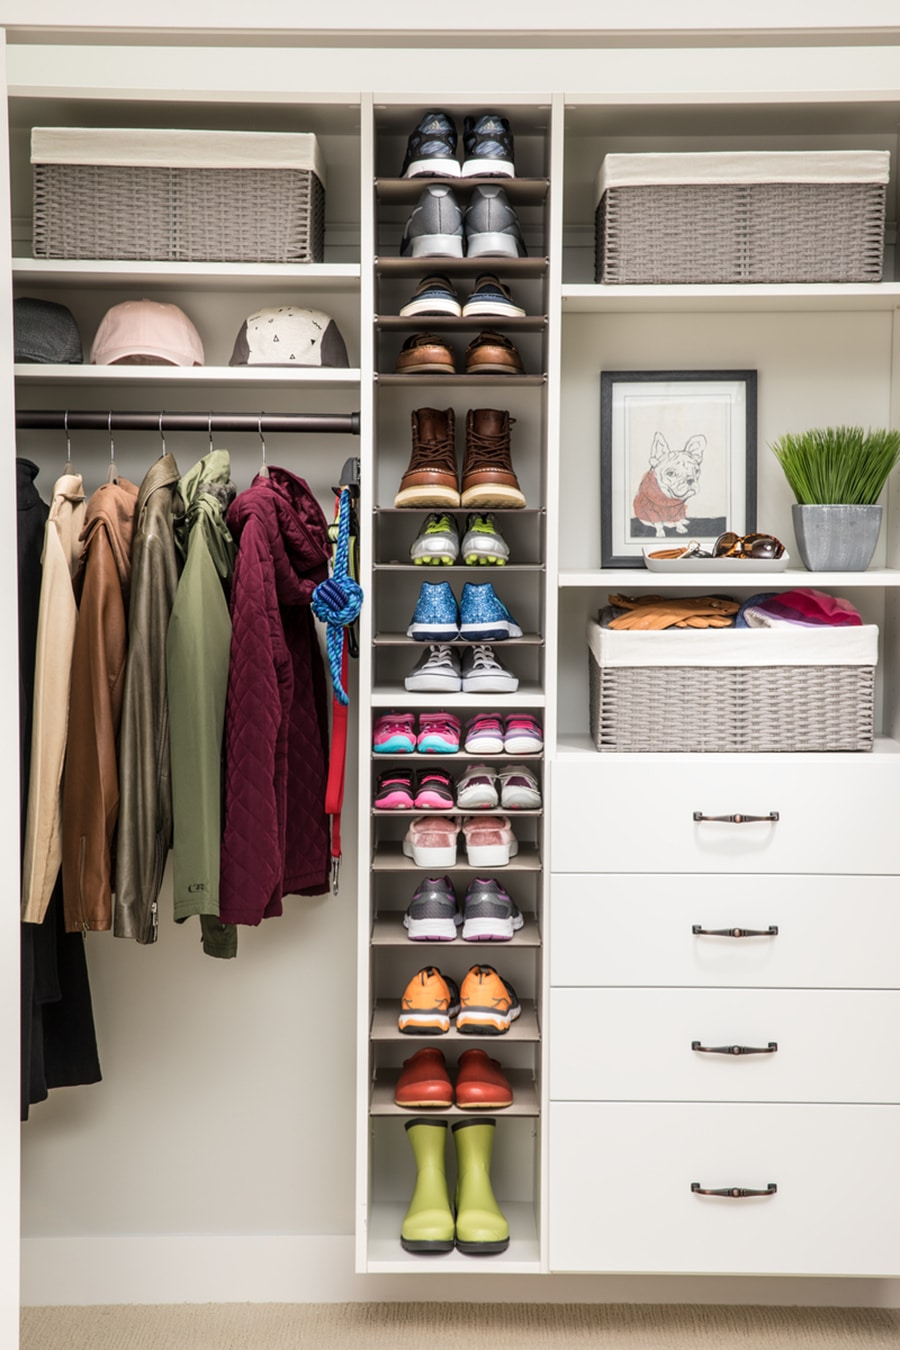 professionally installed laminate closet system Columbus ohio | Innovate Home Org | #CustomCloset #InstallCloset #ProfessionalCloset